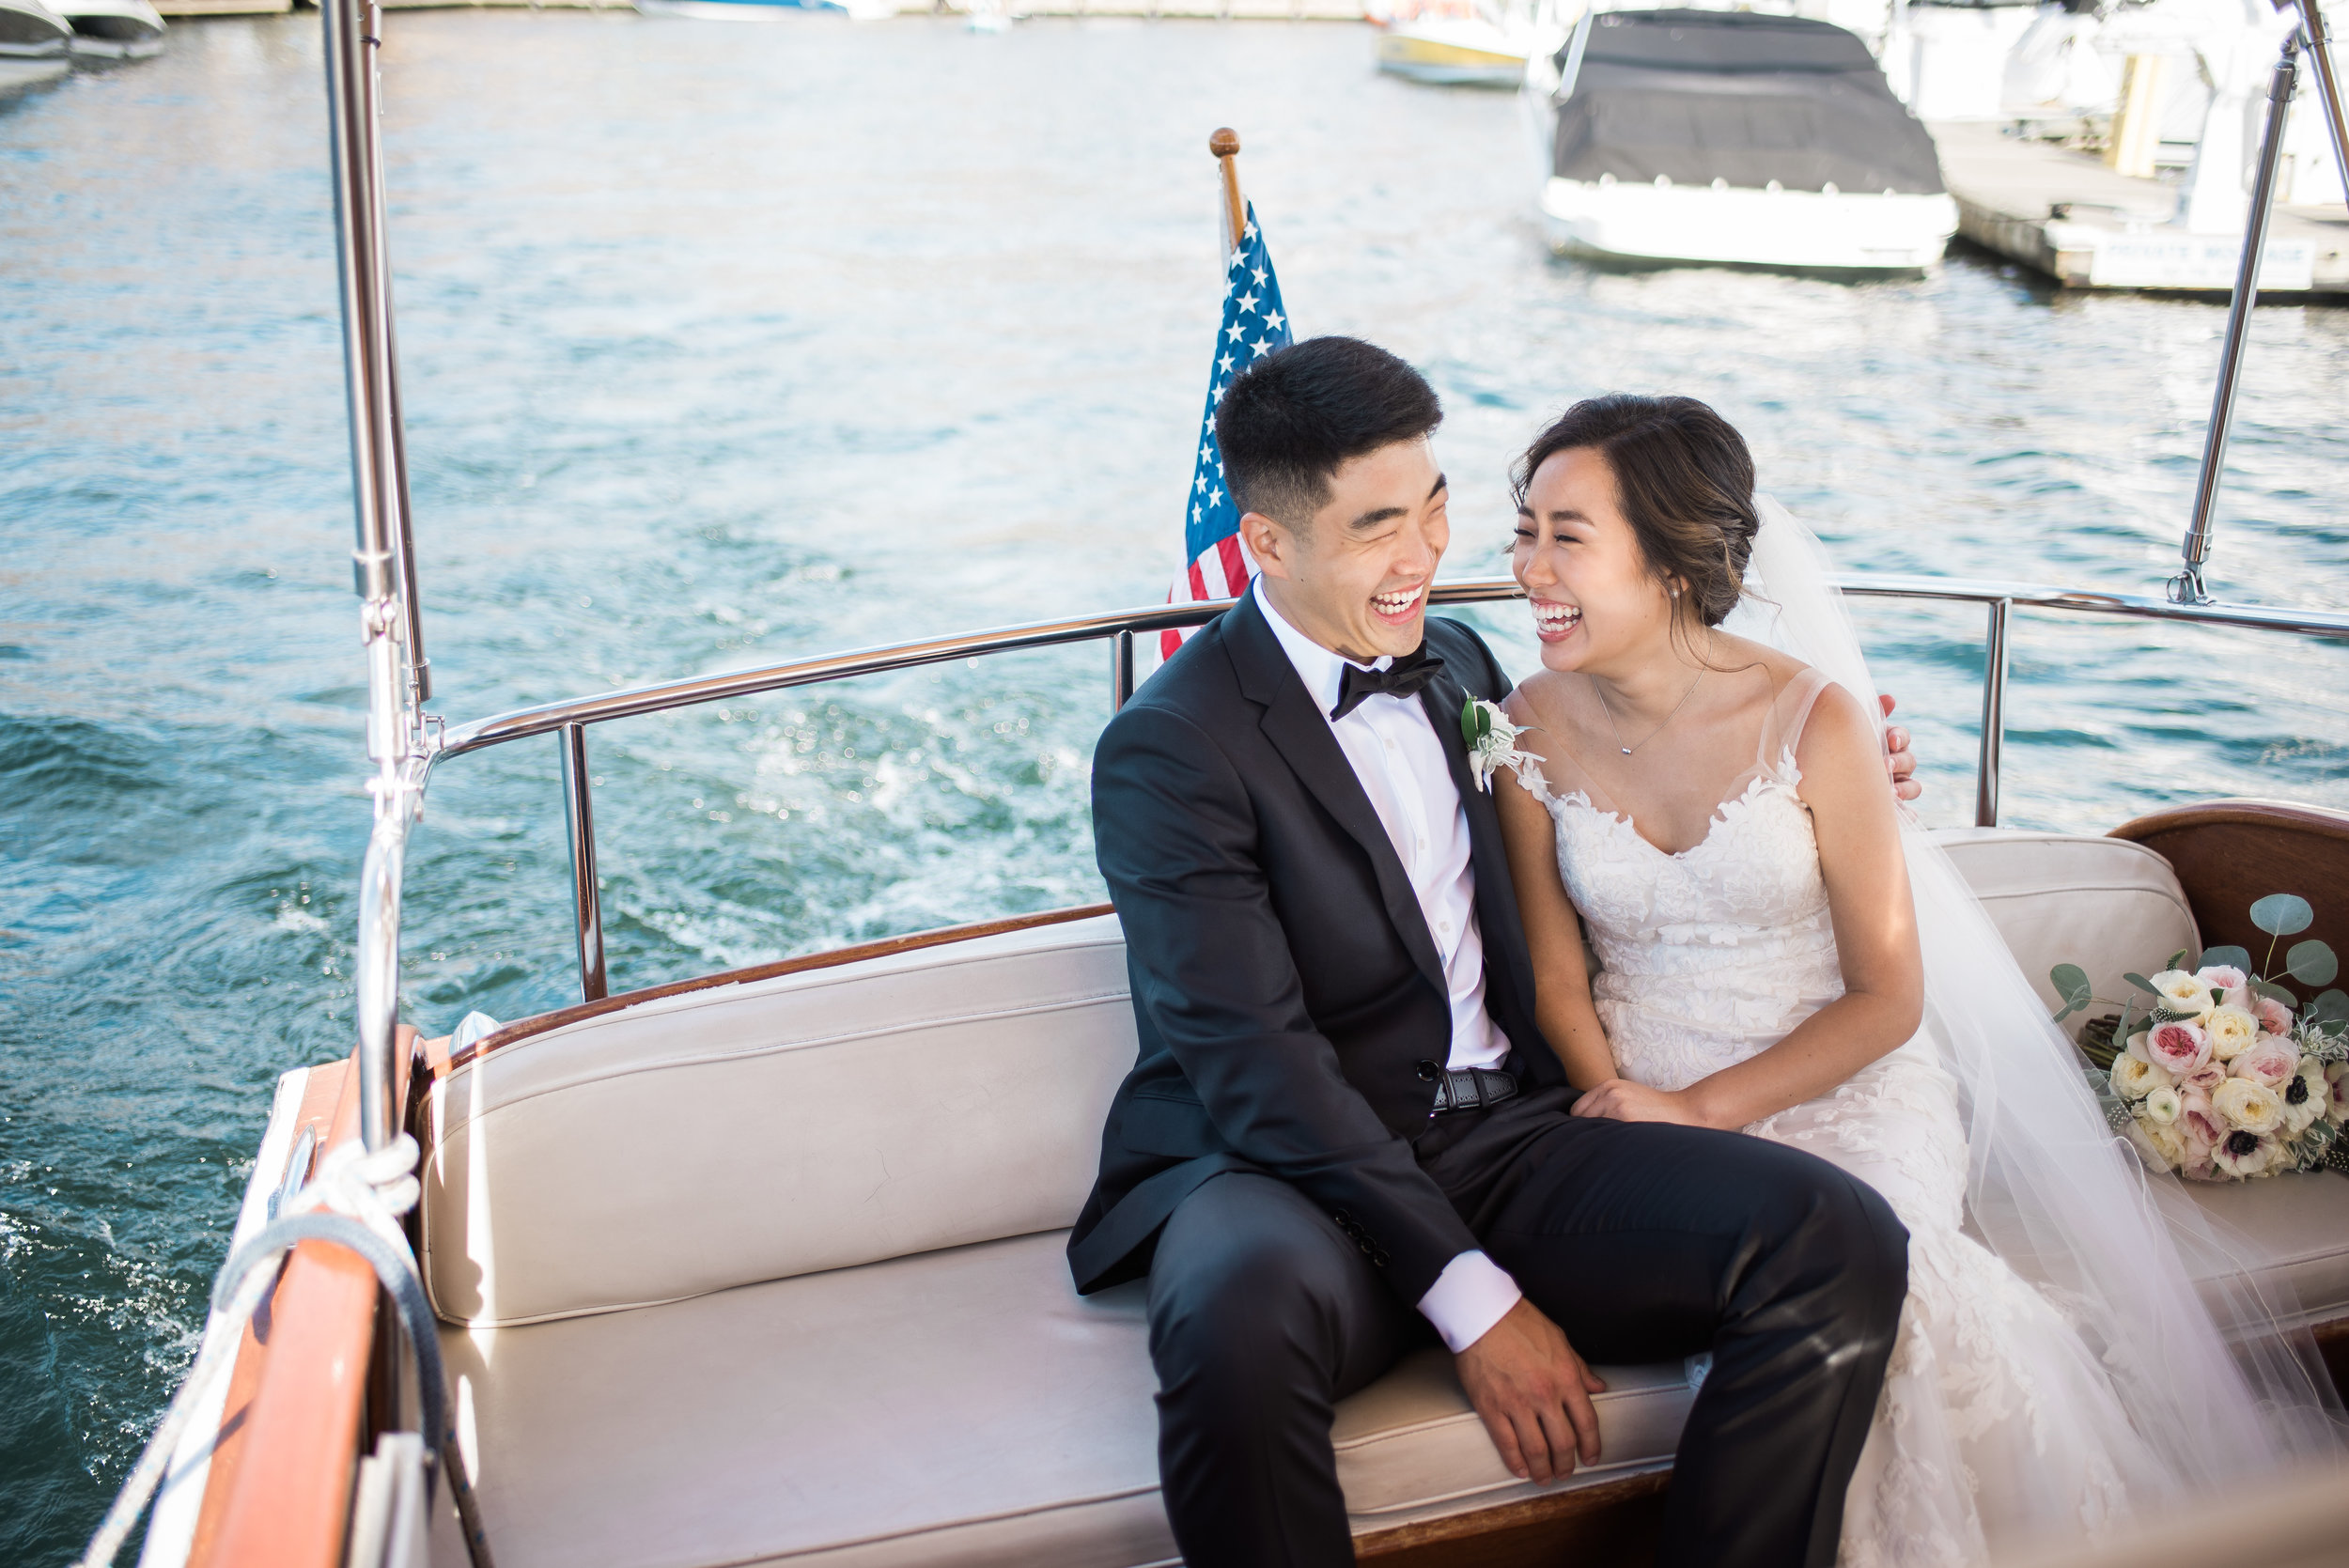 Woodmark Hotel Wedding - Katherine & david8.jpg